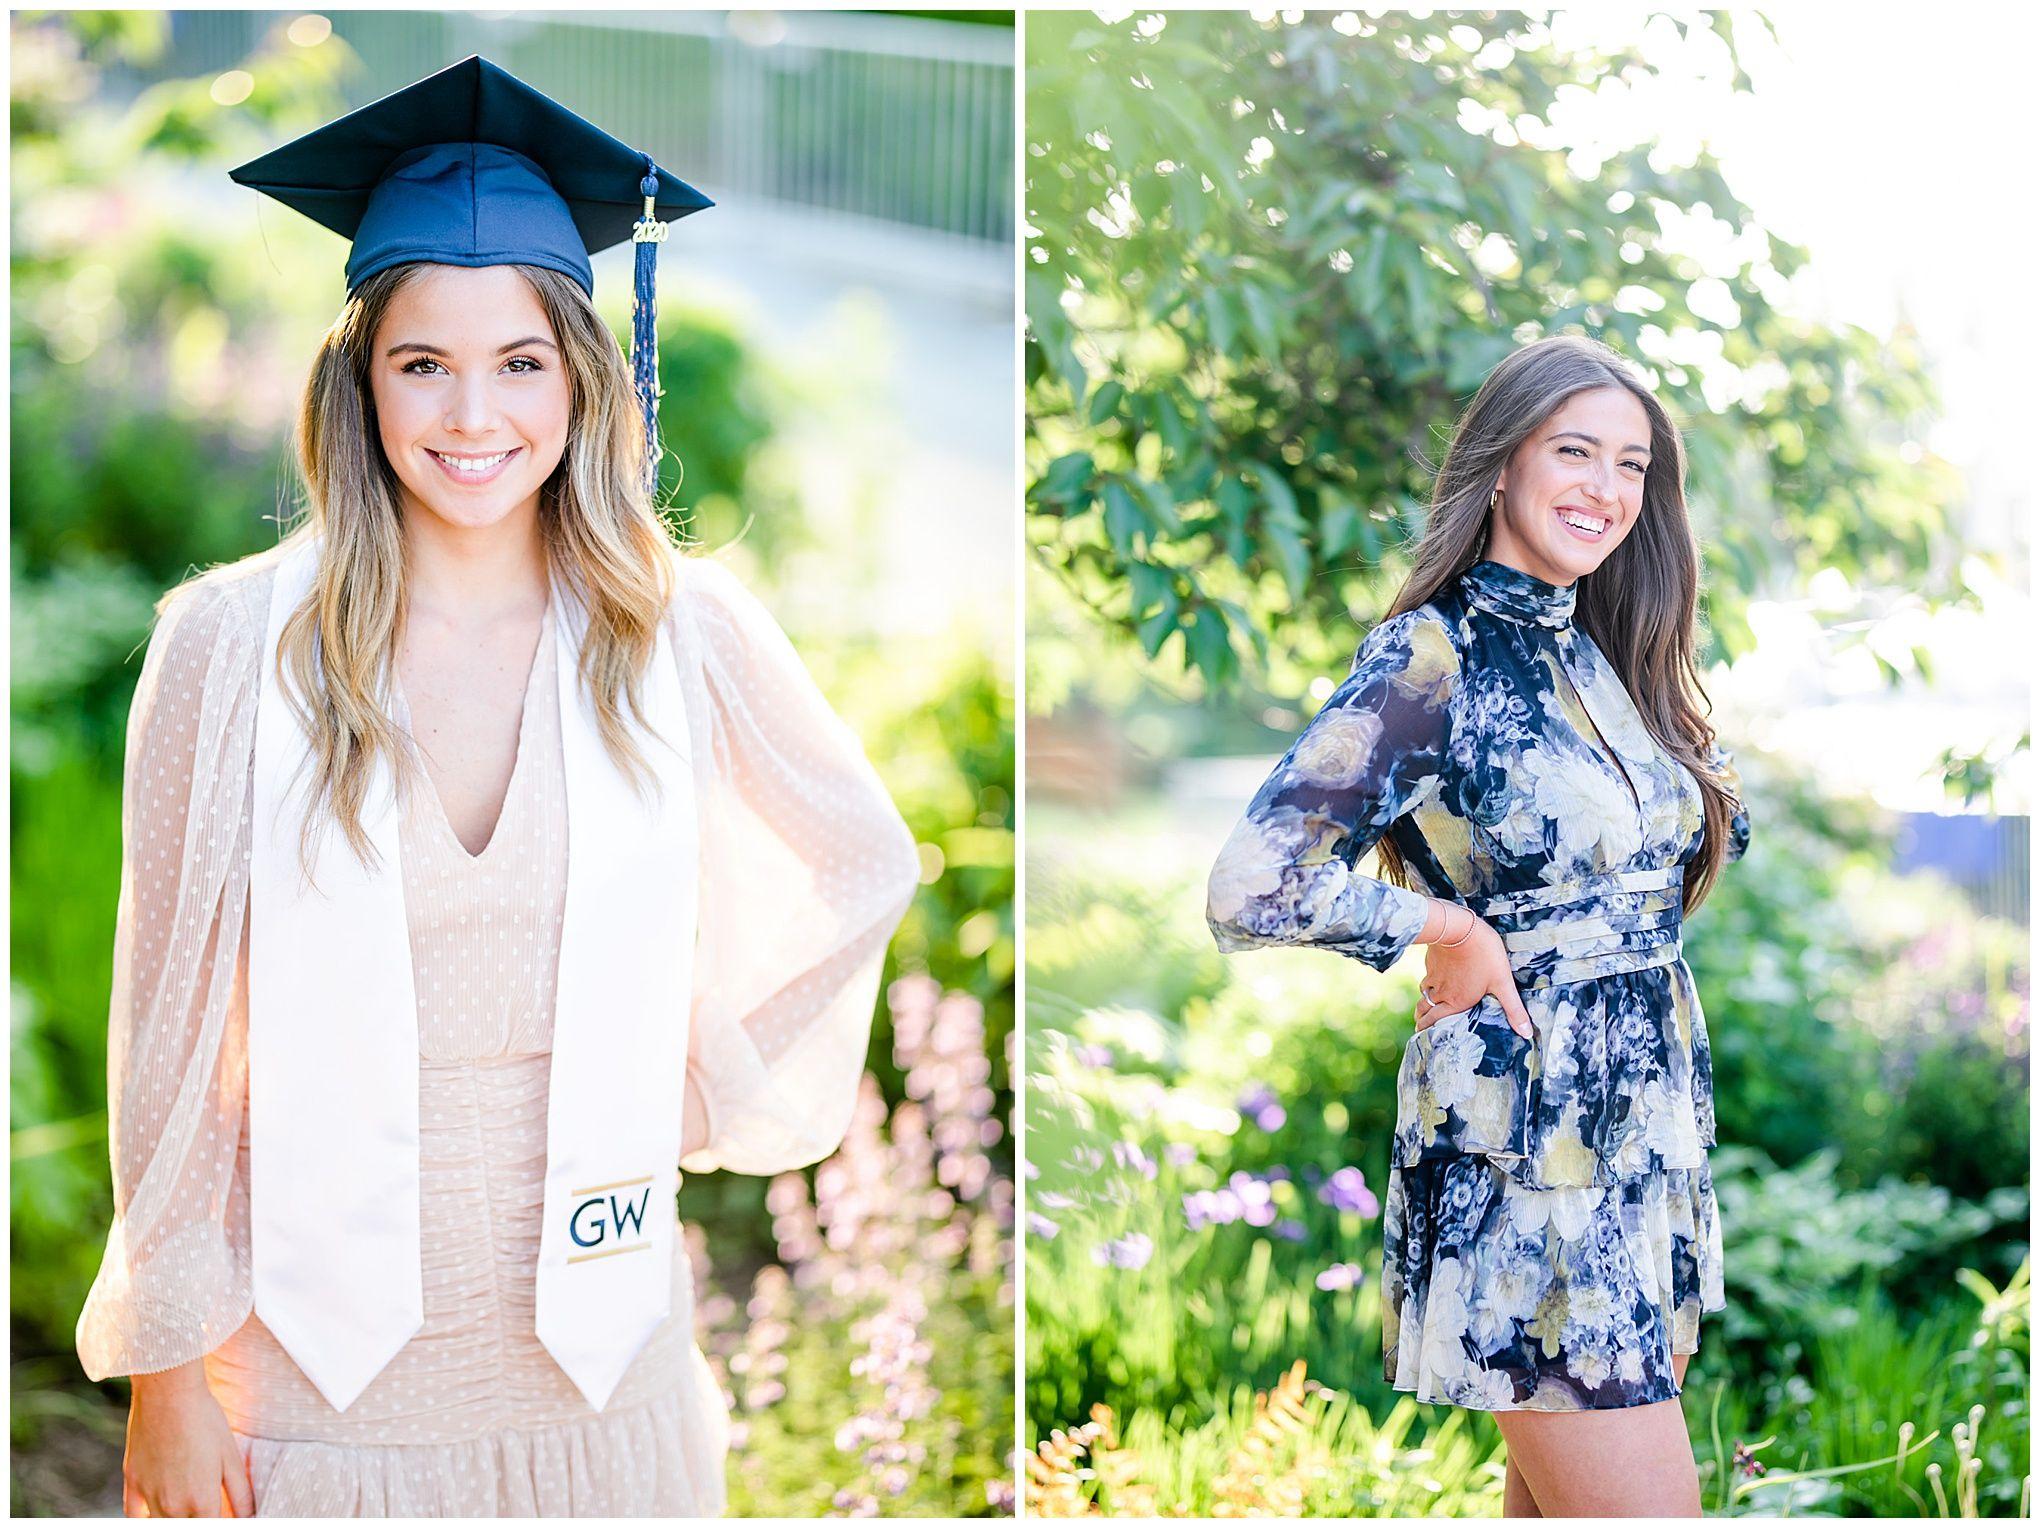 Gw Graduation Photos Showit Blog Graduation Photos Senior Portrait Outfits Graduation Portraits